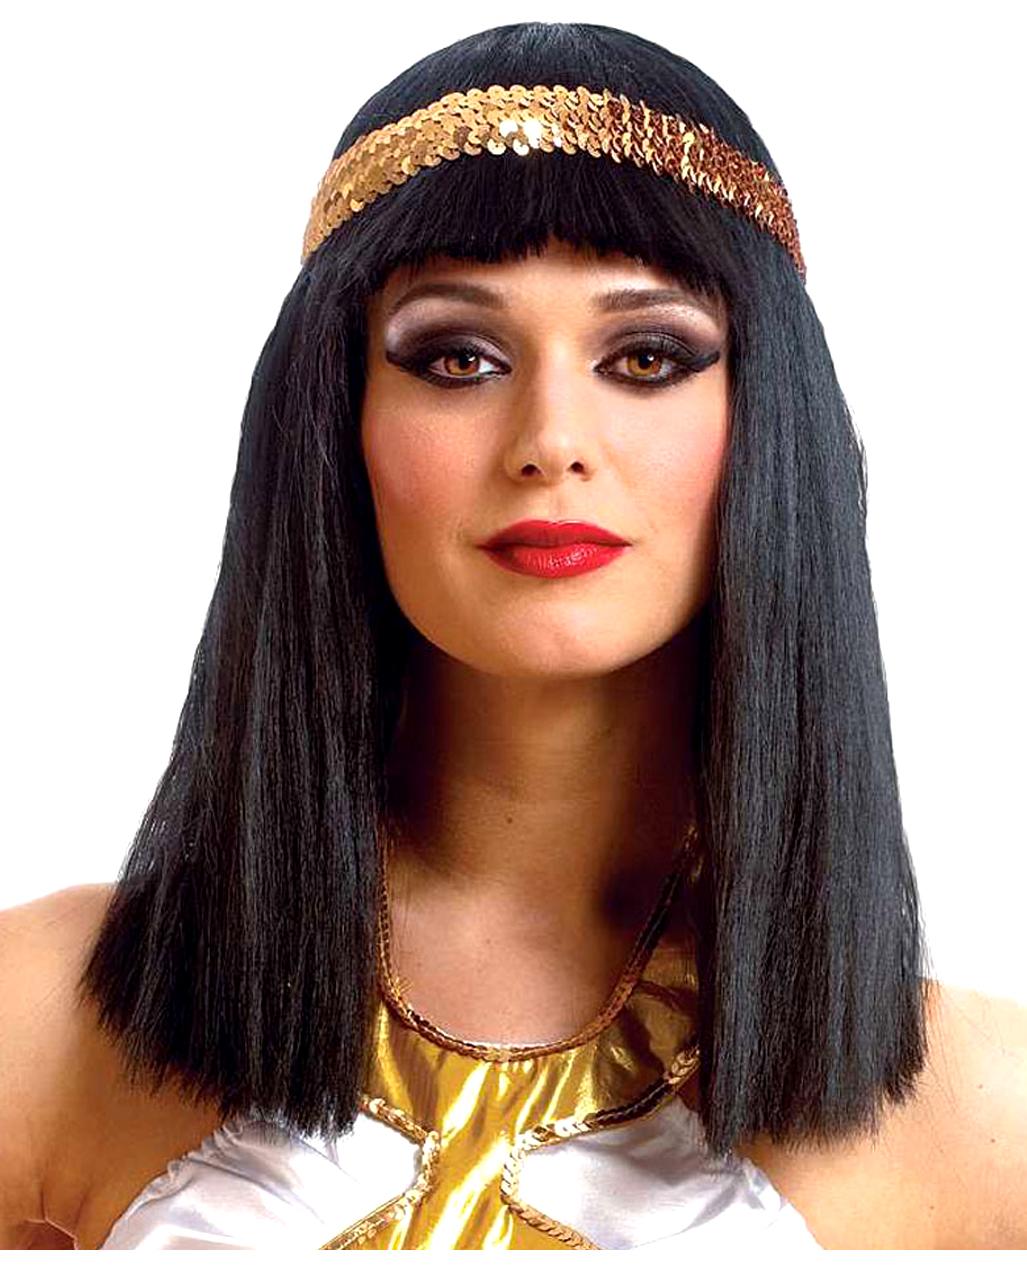 cleopatra per cke mit pailletten stirnband f r halloween horror. Black Bedroom Furniture Sets. Home Design Ideas